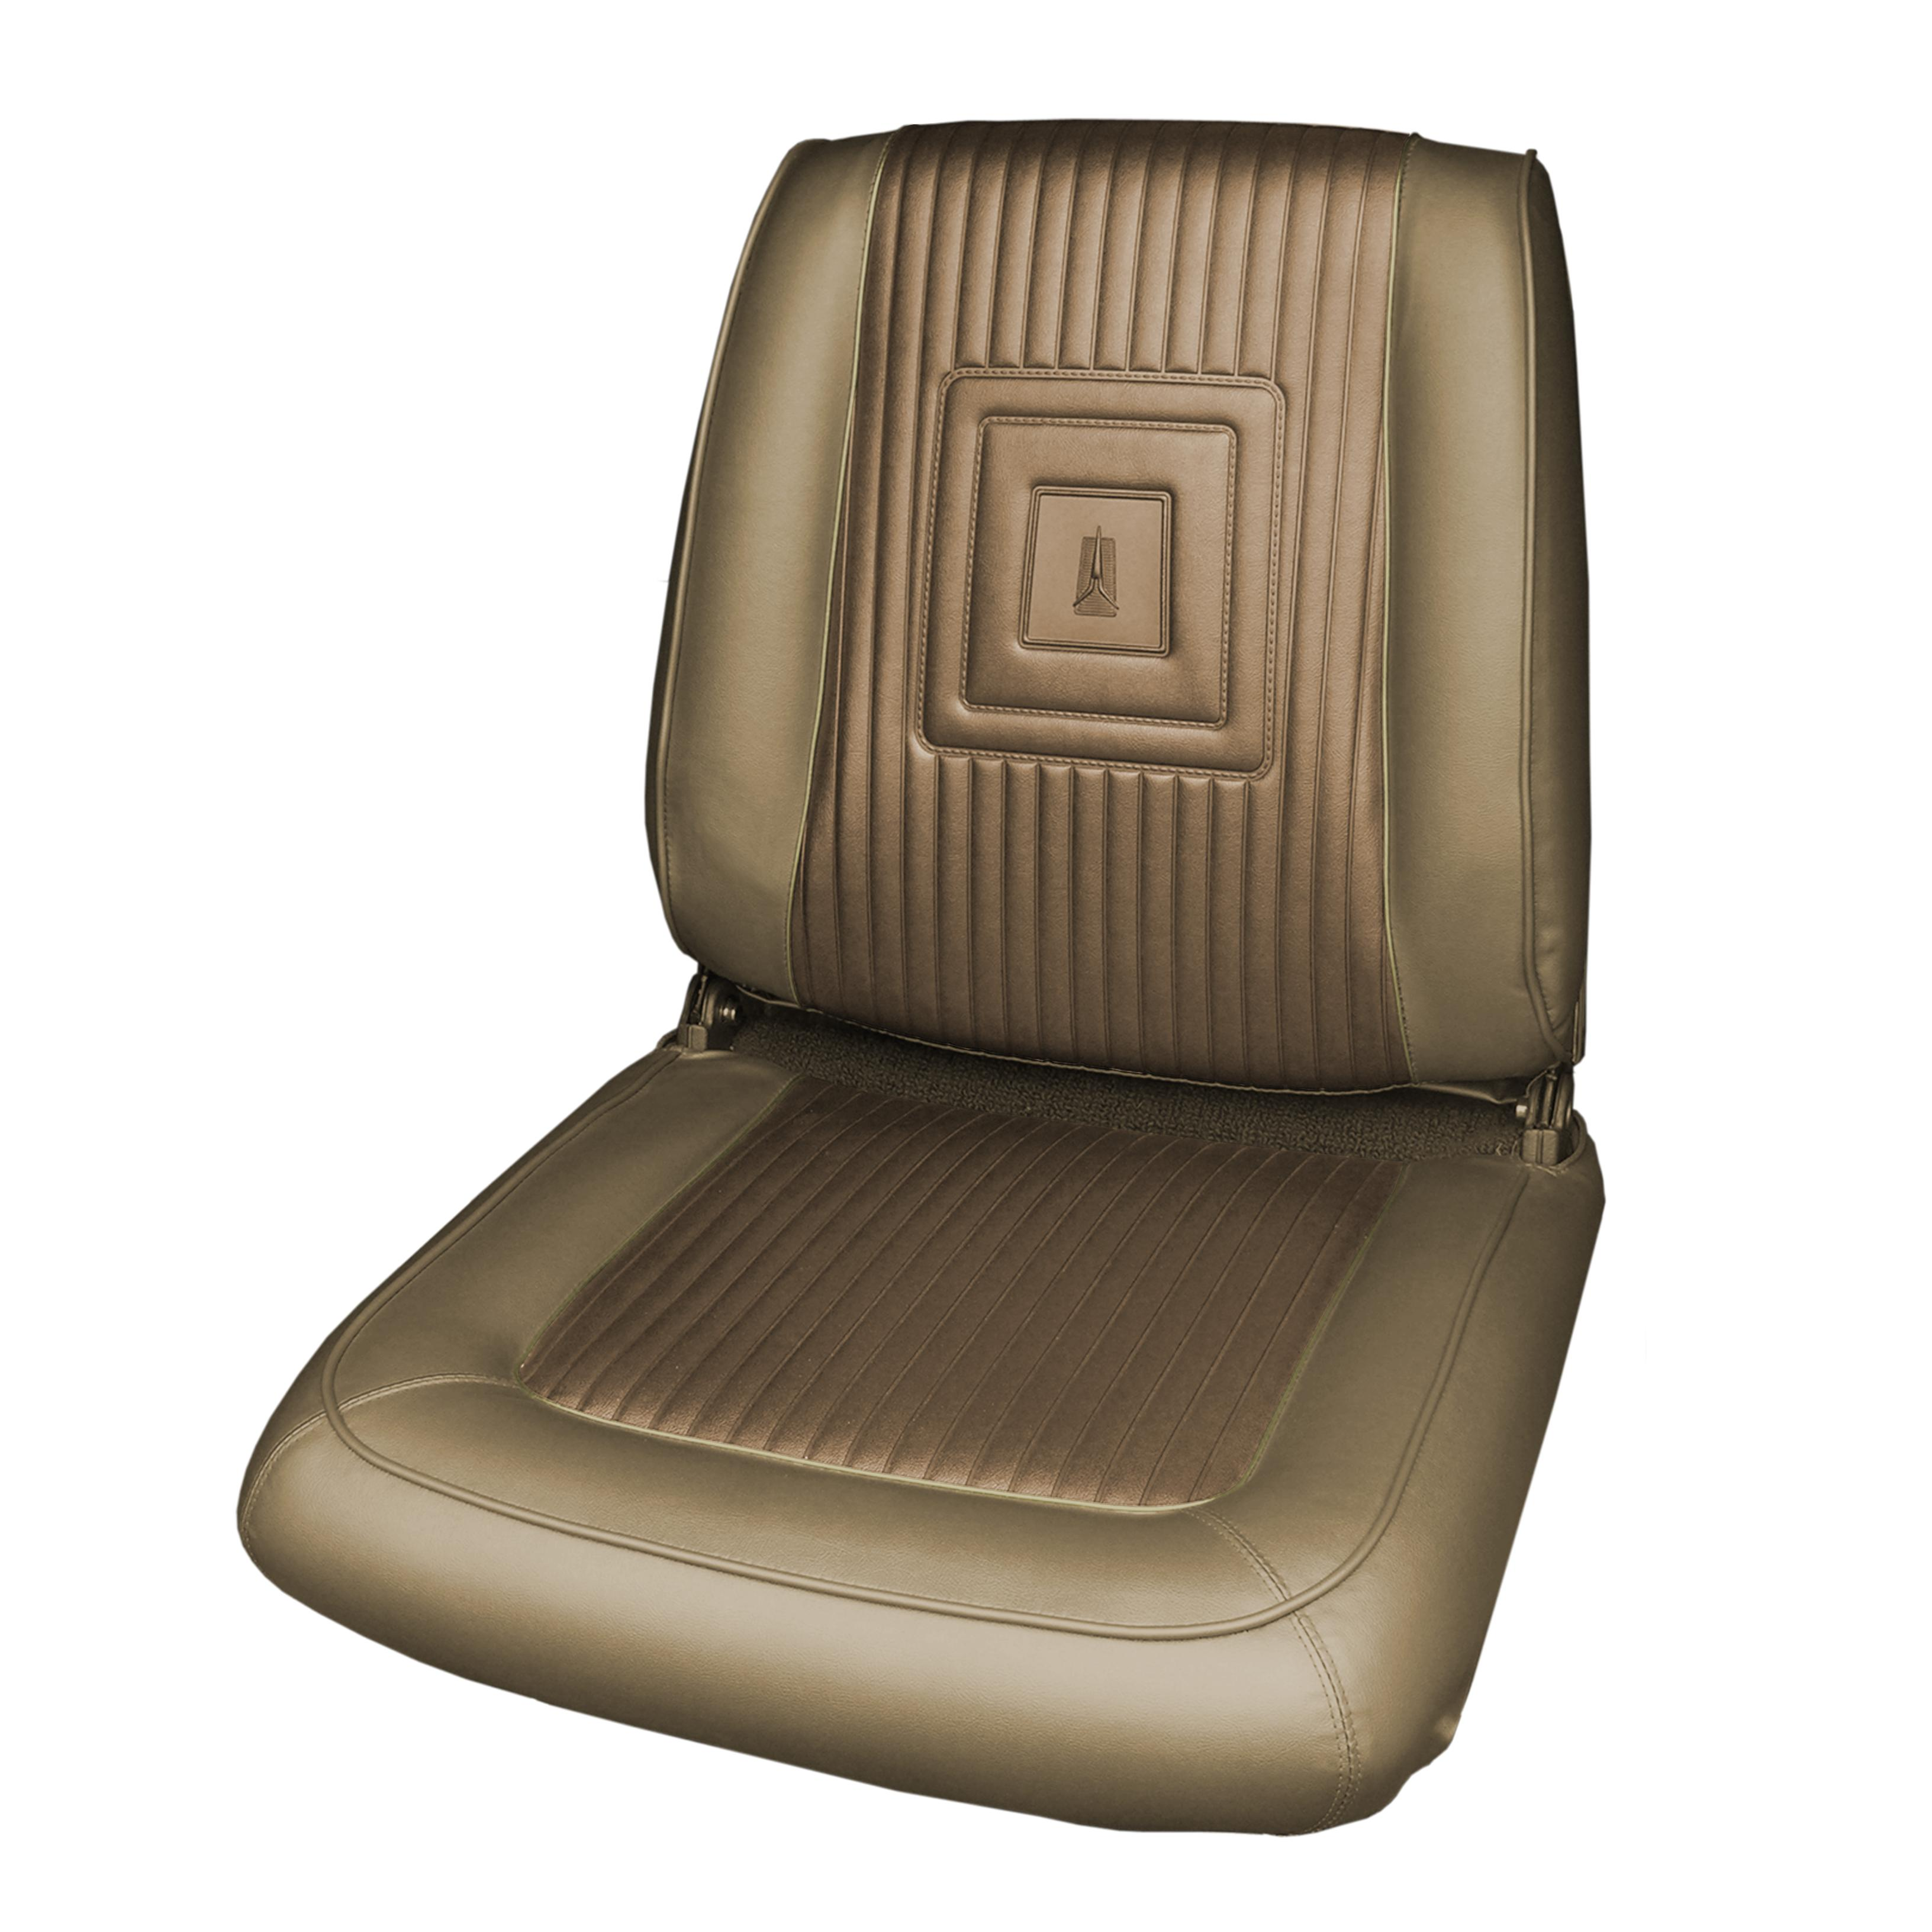 1d5f1fcd44d 65 SATELLITE BUCKET SEAT UPH LSRM DK METALLIC GOLD GOLD